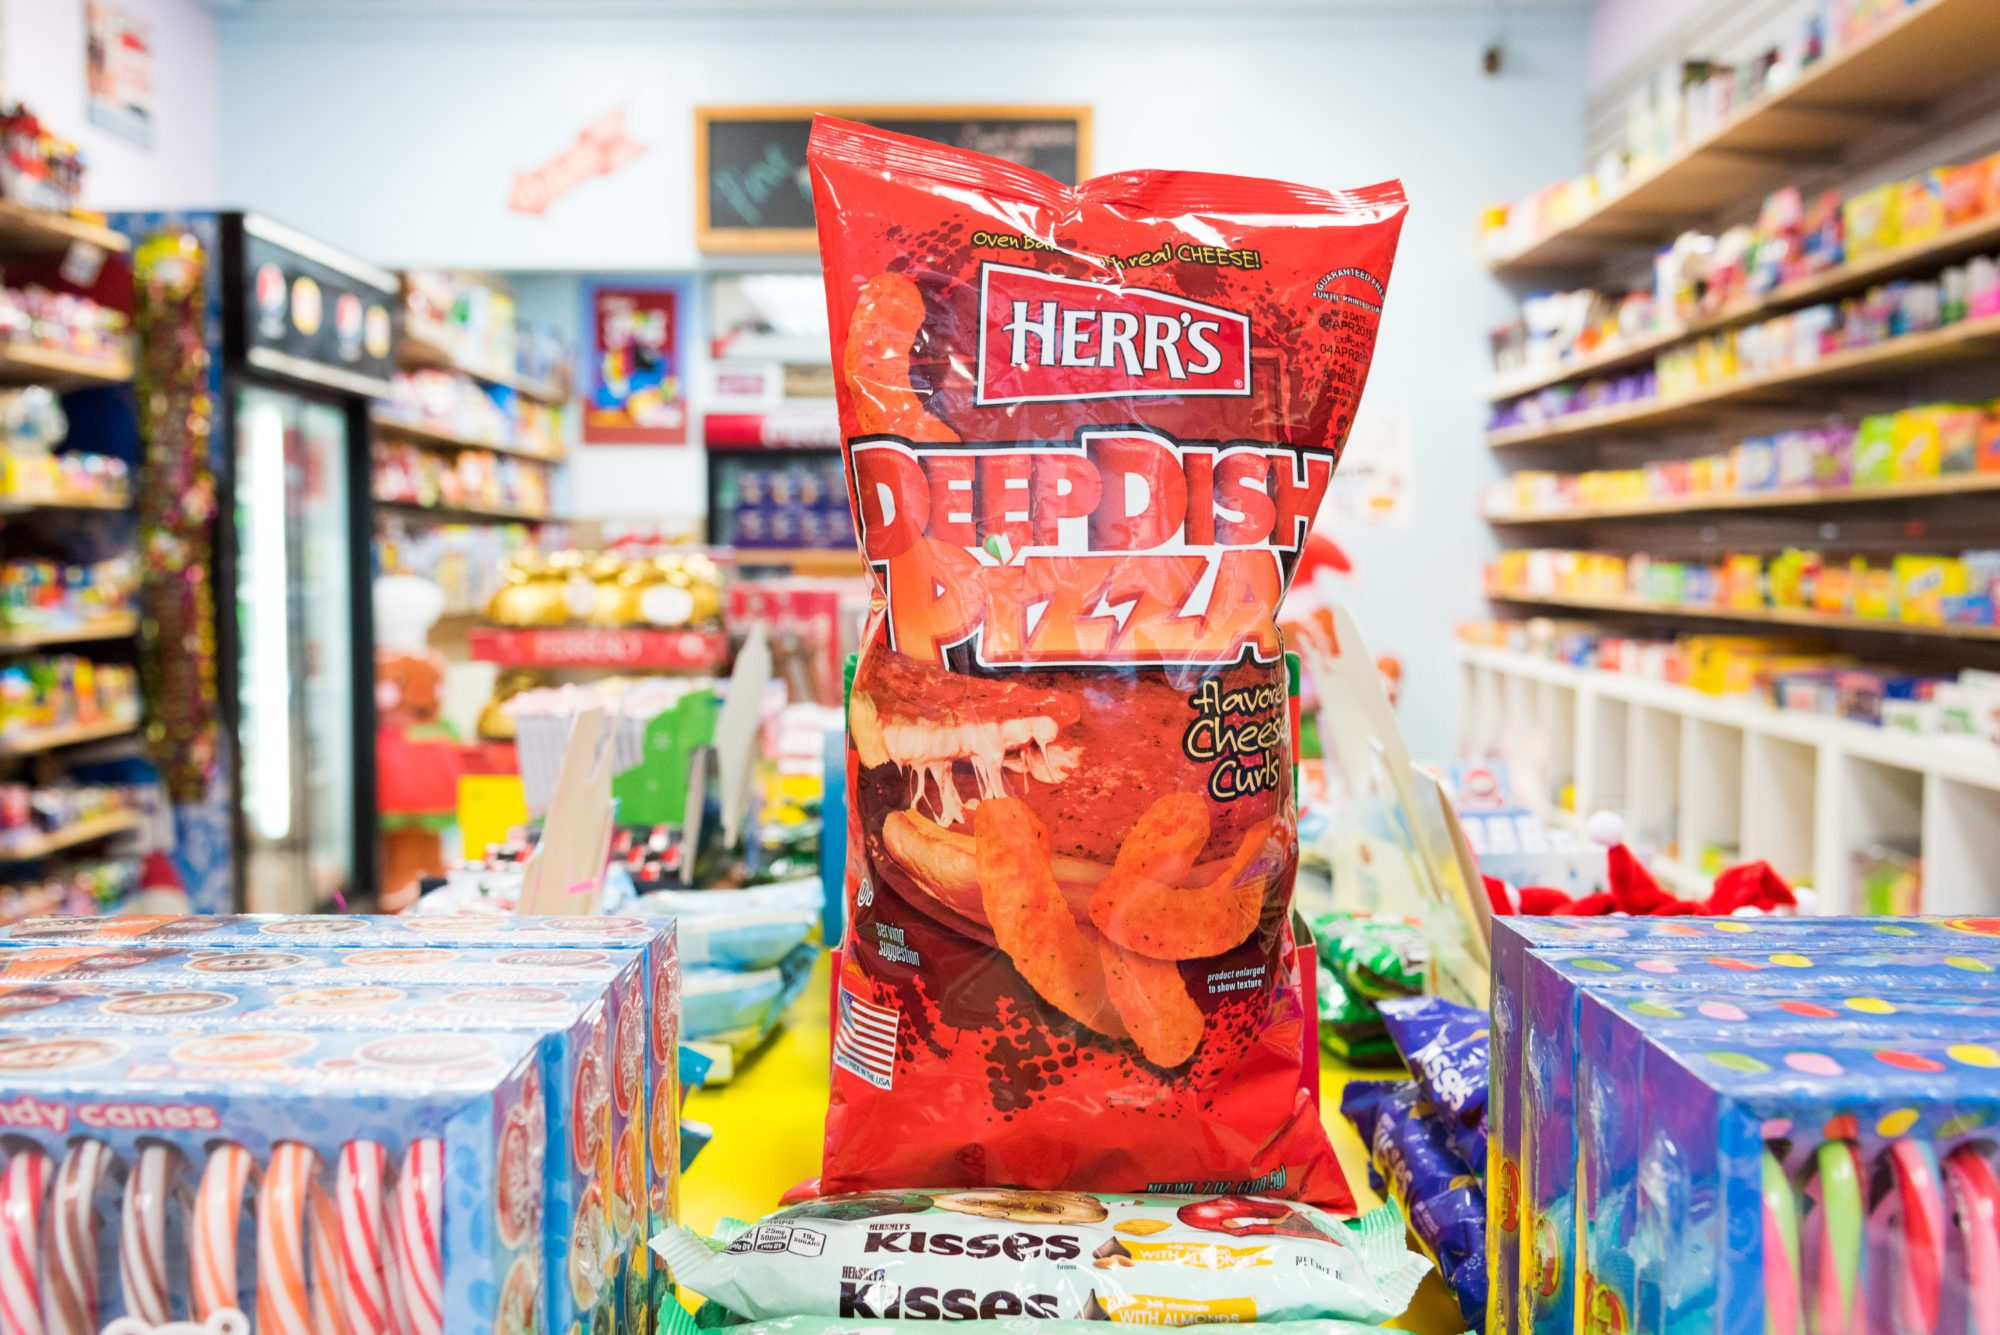 toronto-food-shops-ridiculist-sweet-addictions-candy-co-deep-dish-pizza-cheesies